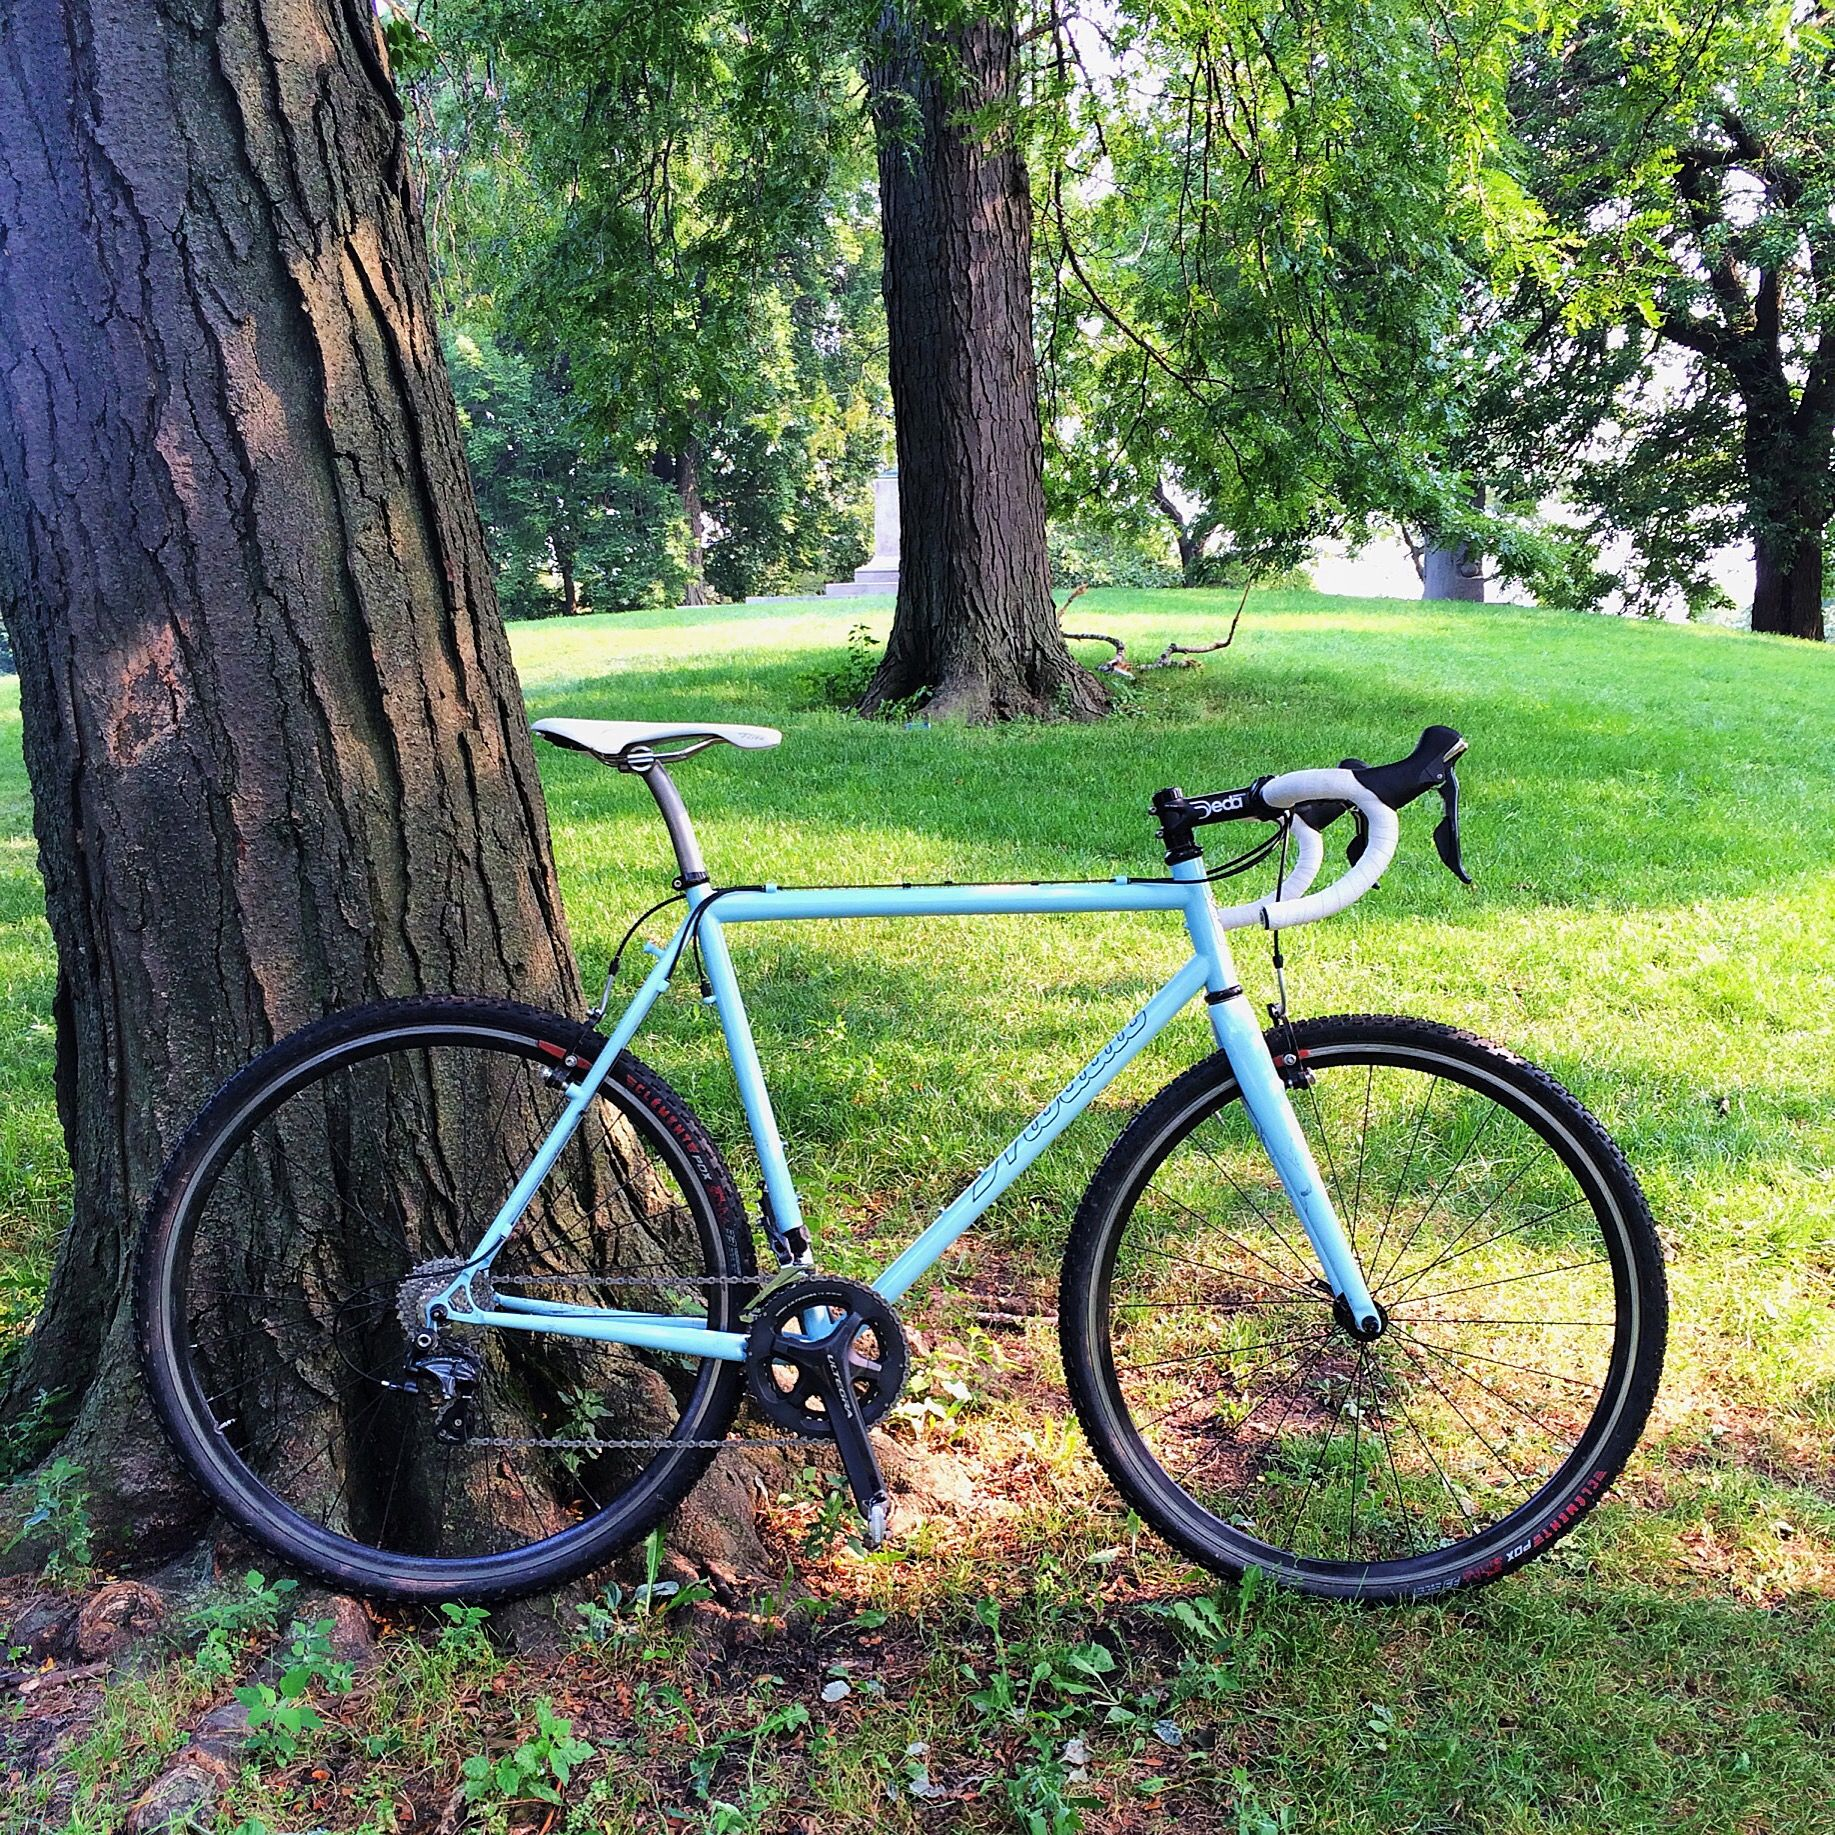 My Mosaic Xs 1 Cyclocross Bike Zero Carbon Footprint